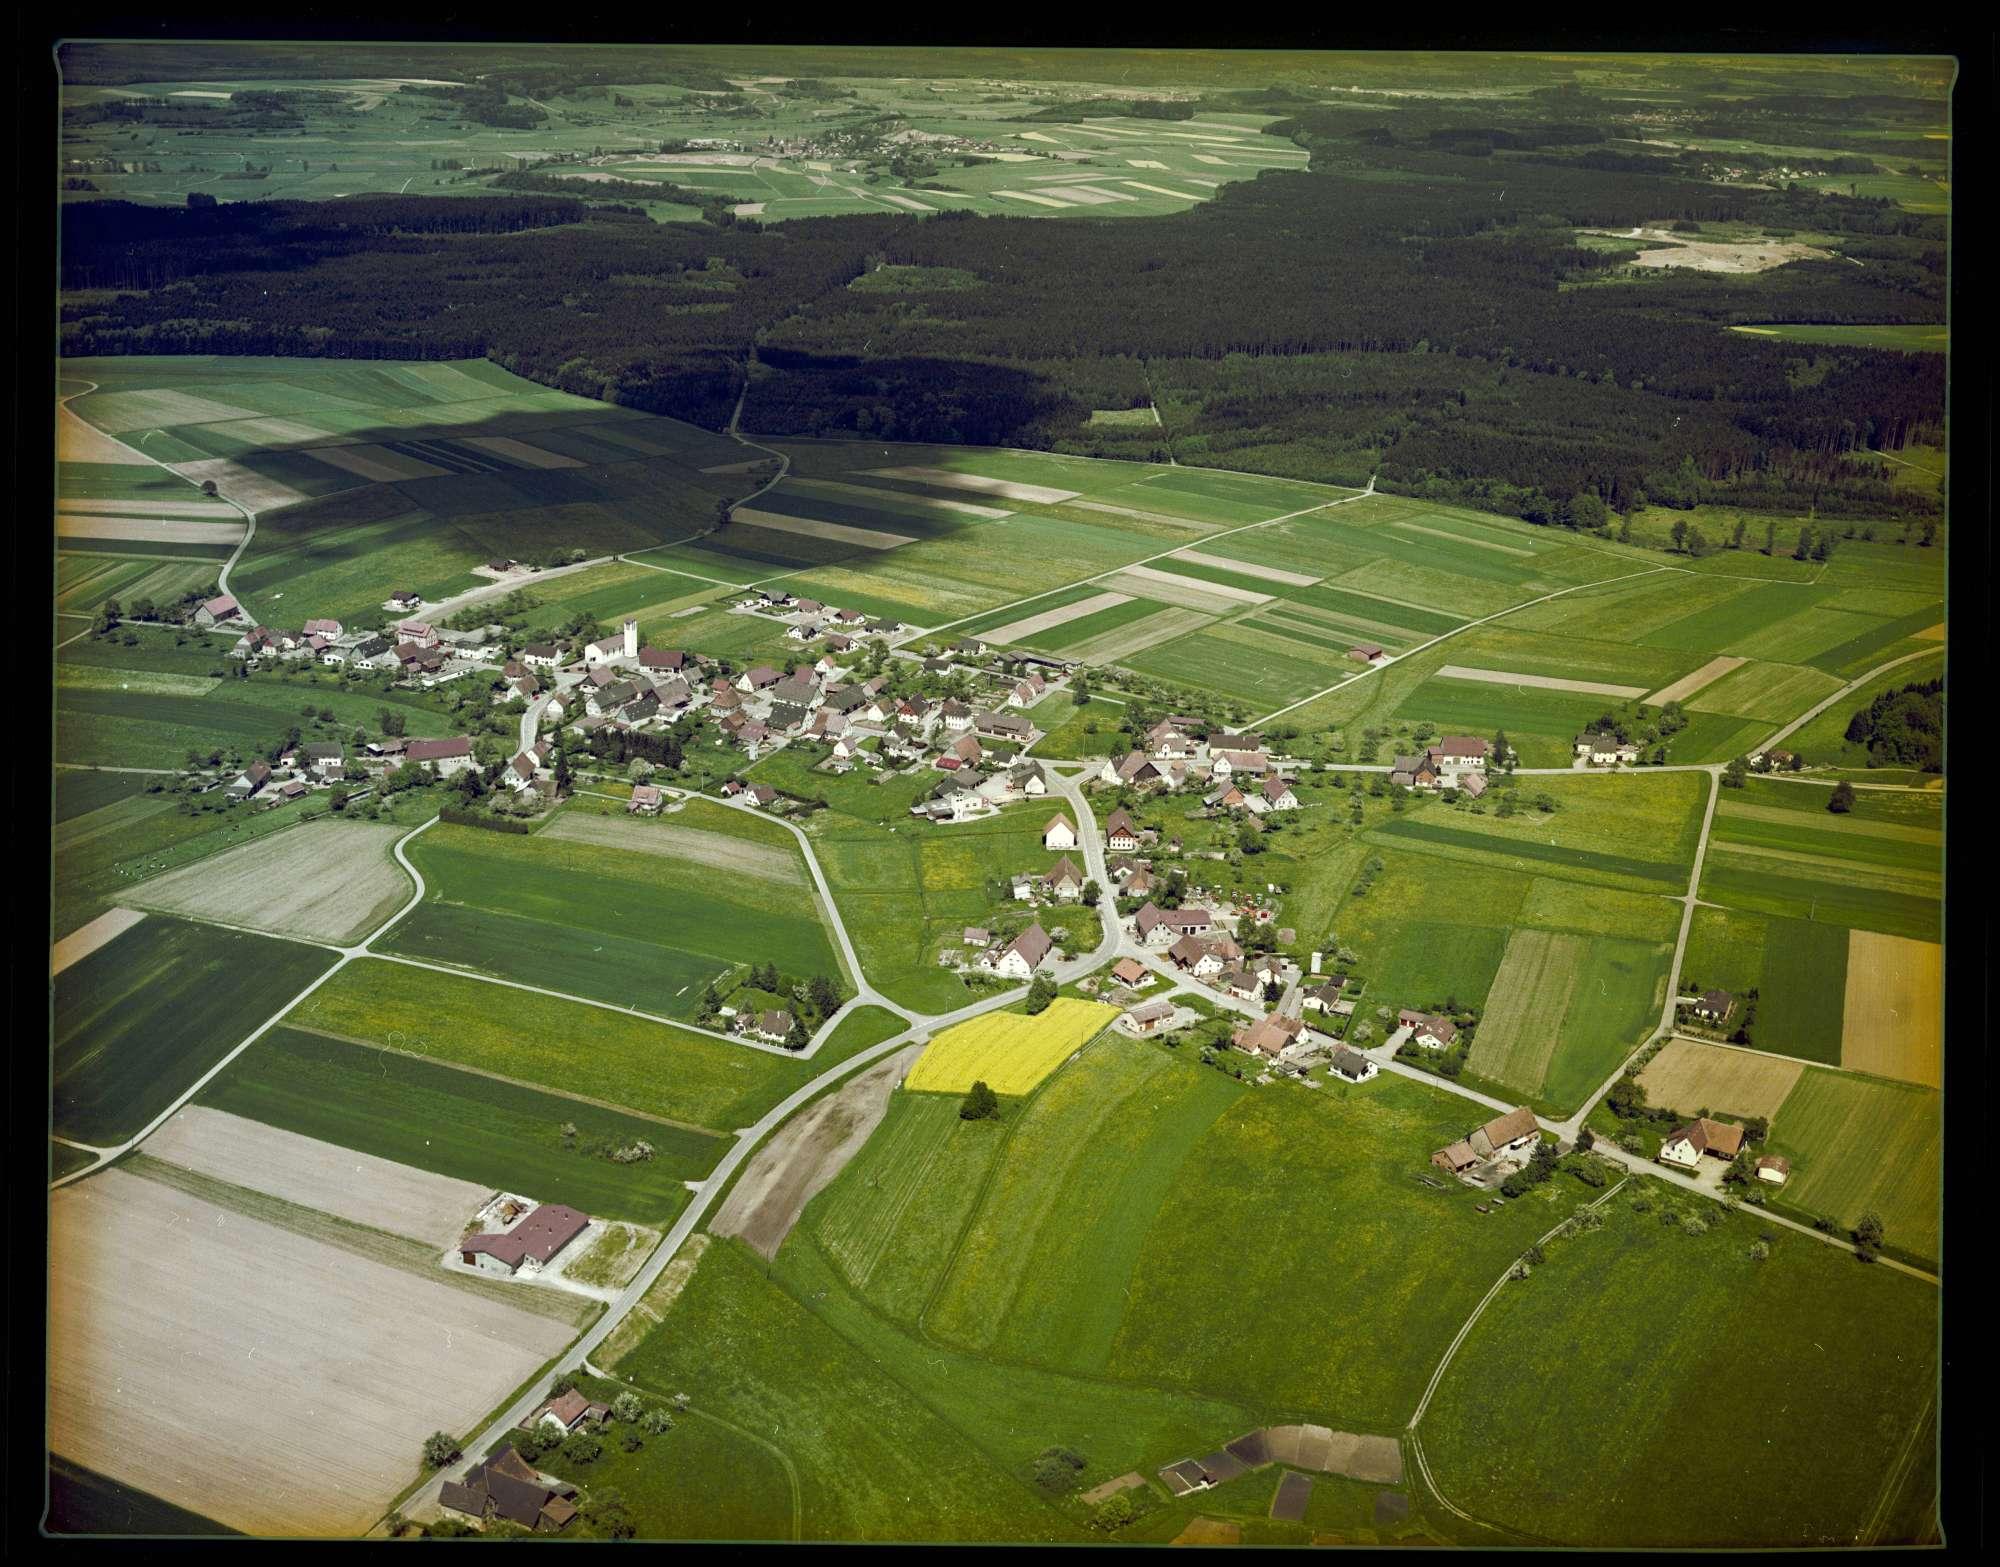 Rengetsweiler, Luftbild, Bild 1